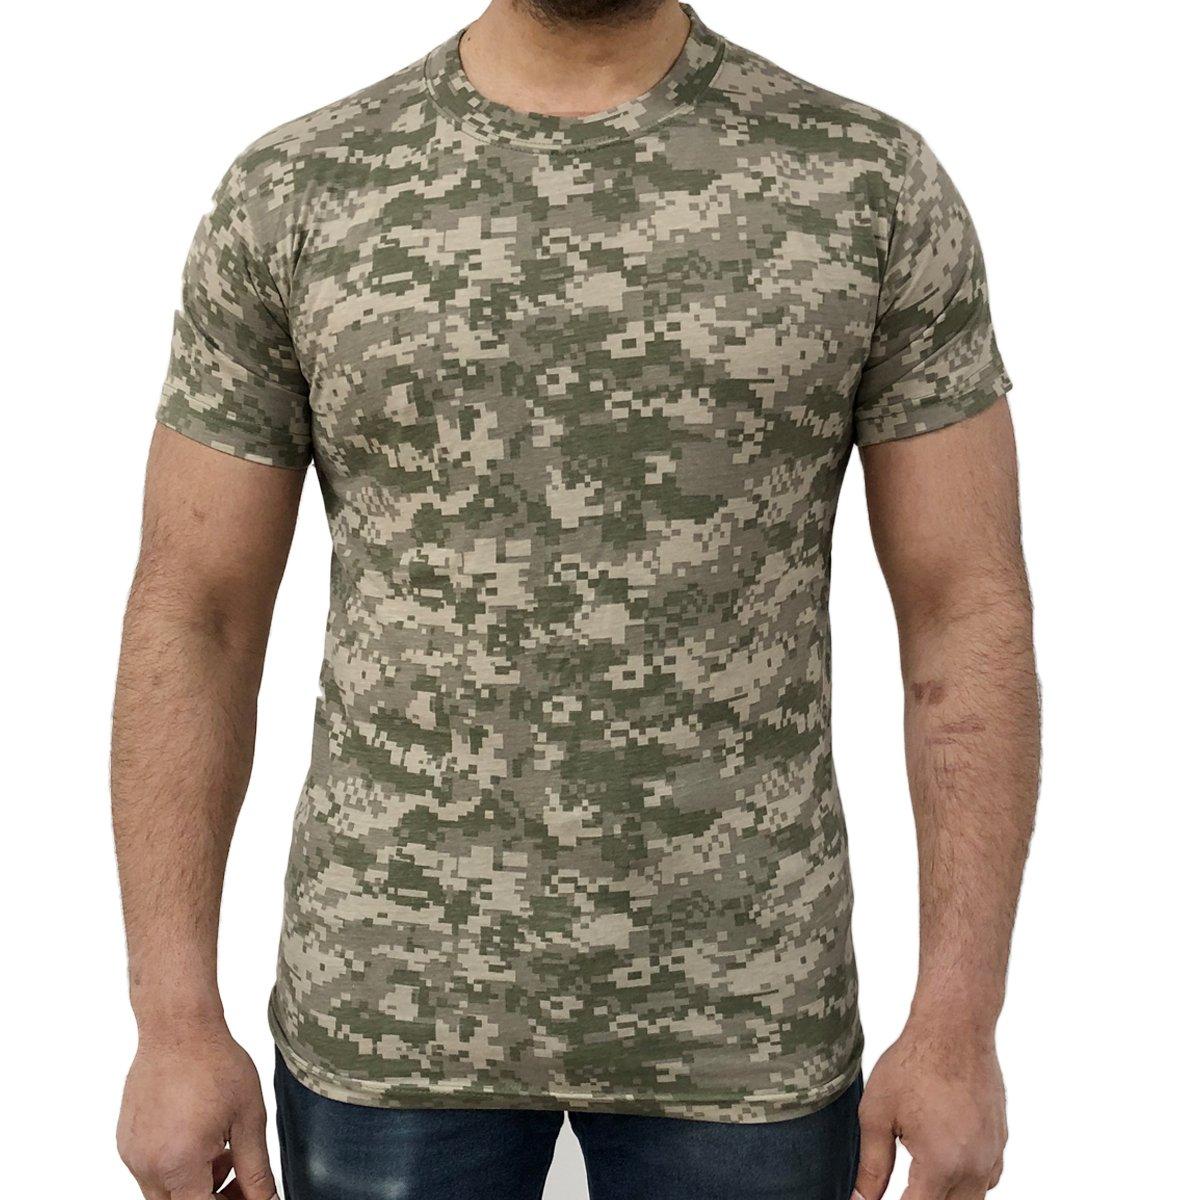 Game Digital Camouflage T-Shirts - Digital Desert S